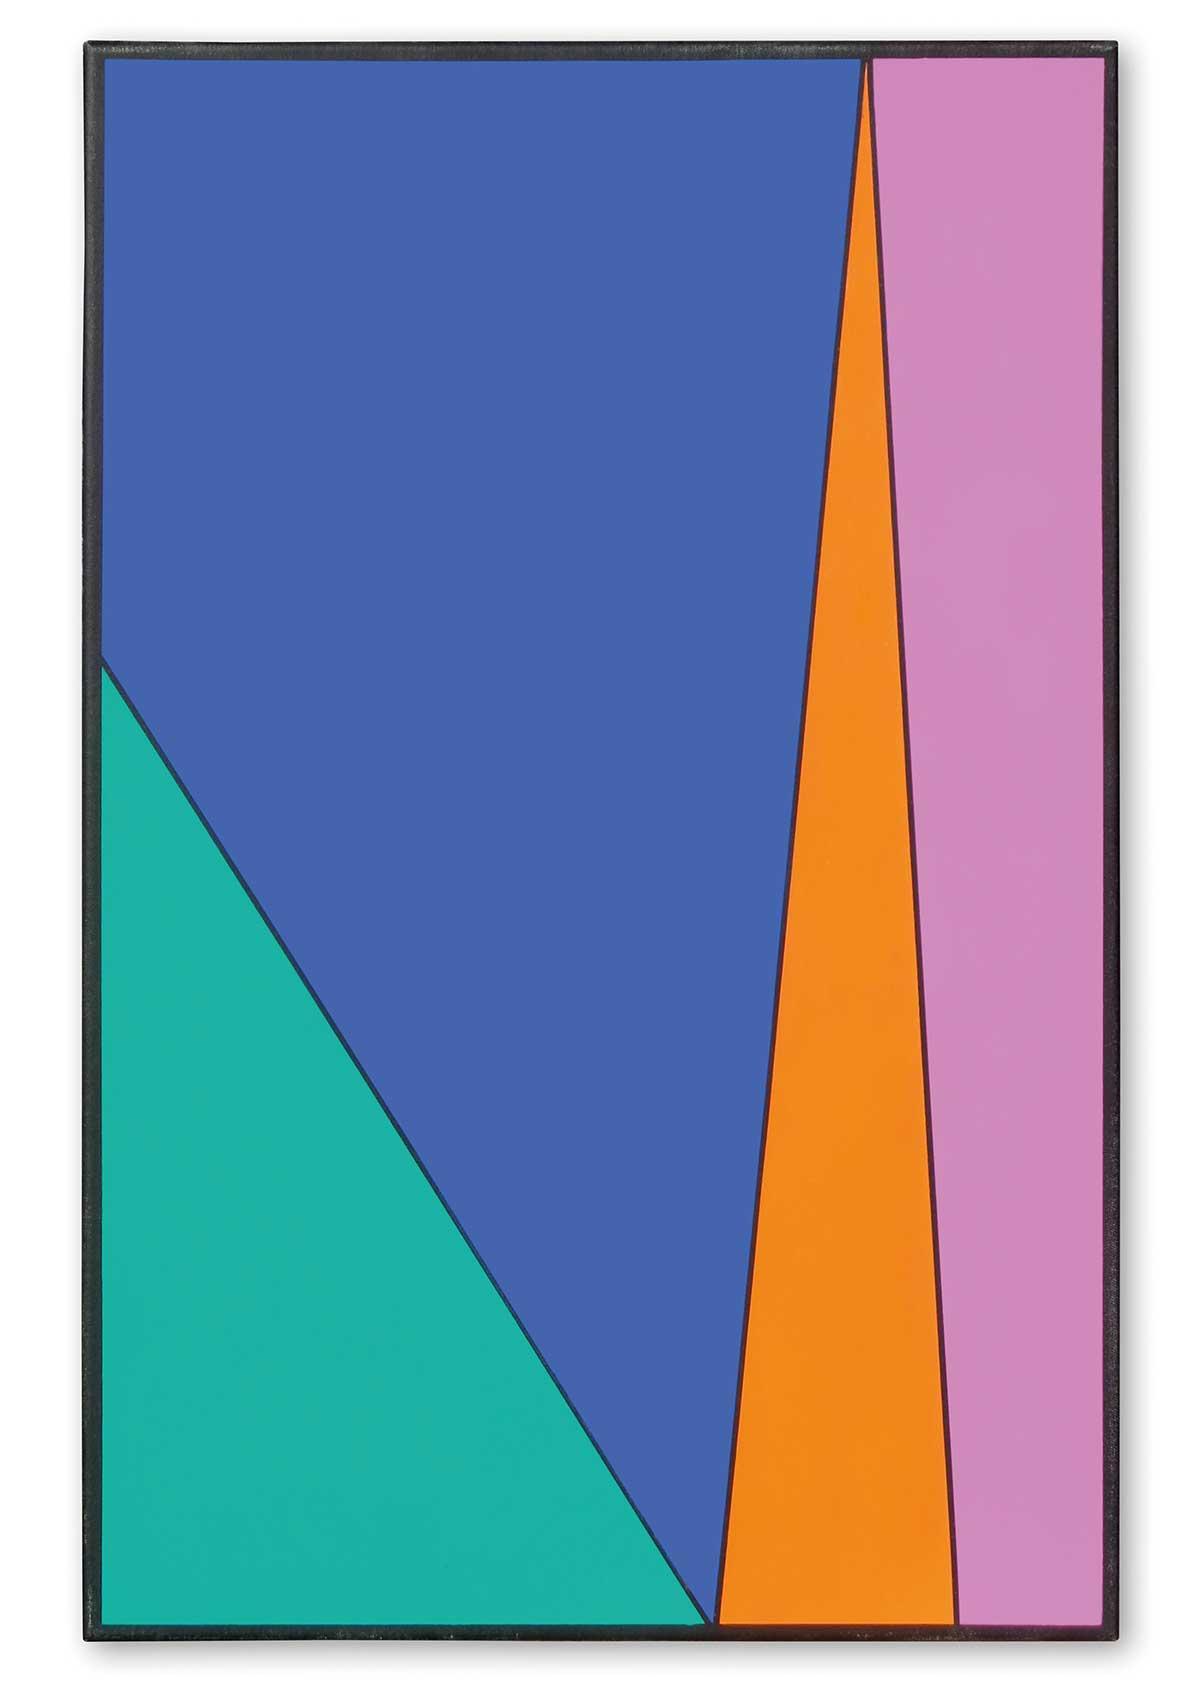 Bildausschnitt aus der Neujahrskarte Friedrich Schmuck Farbdesigner